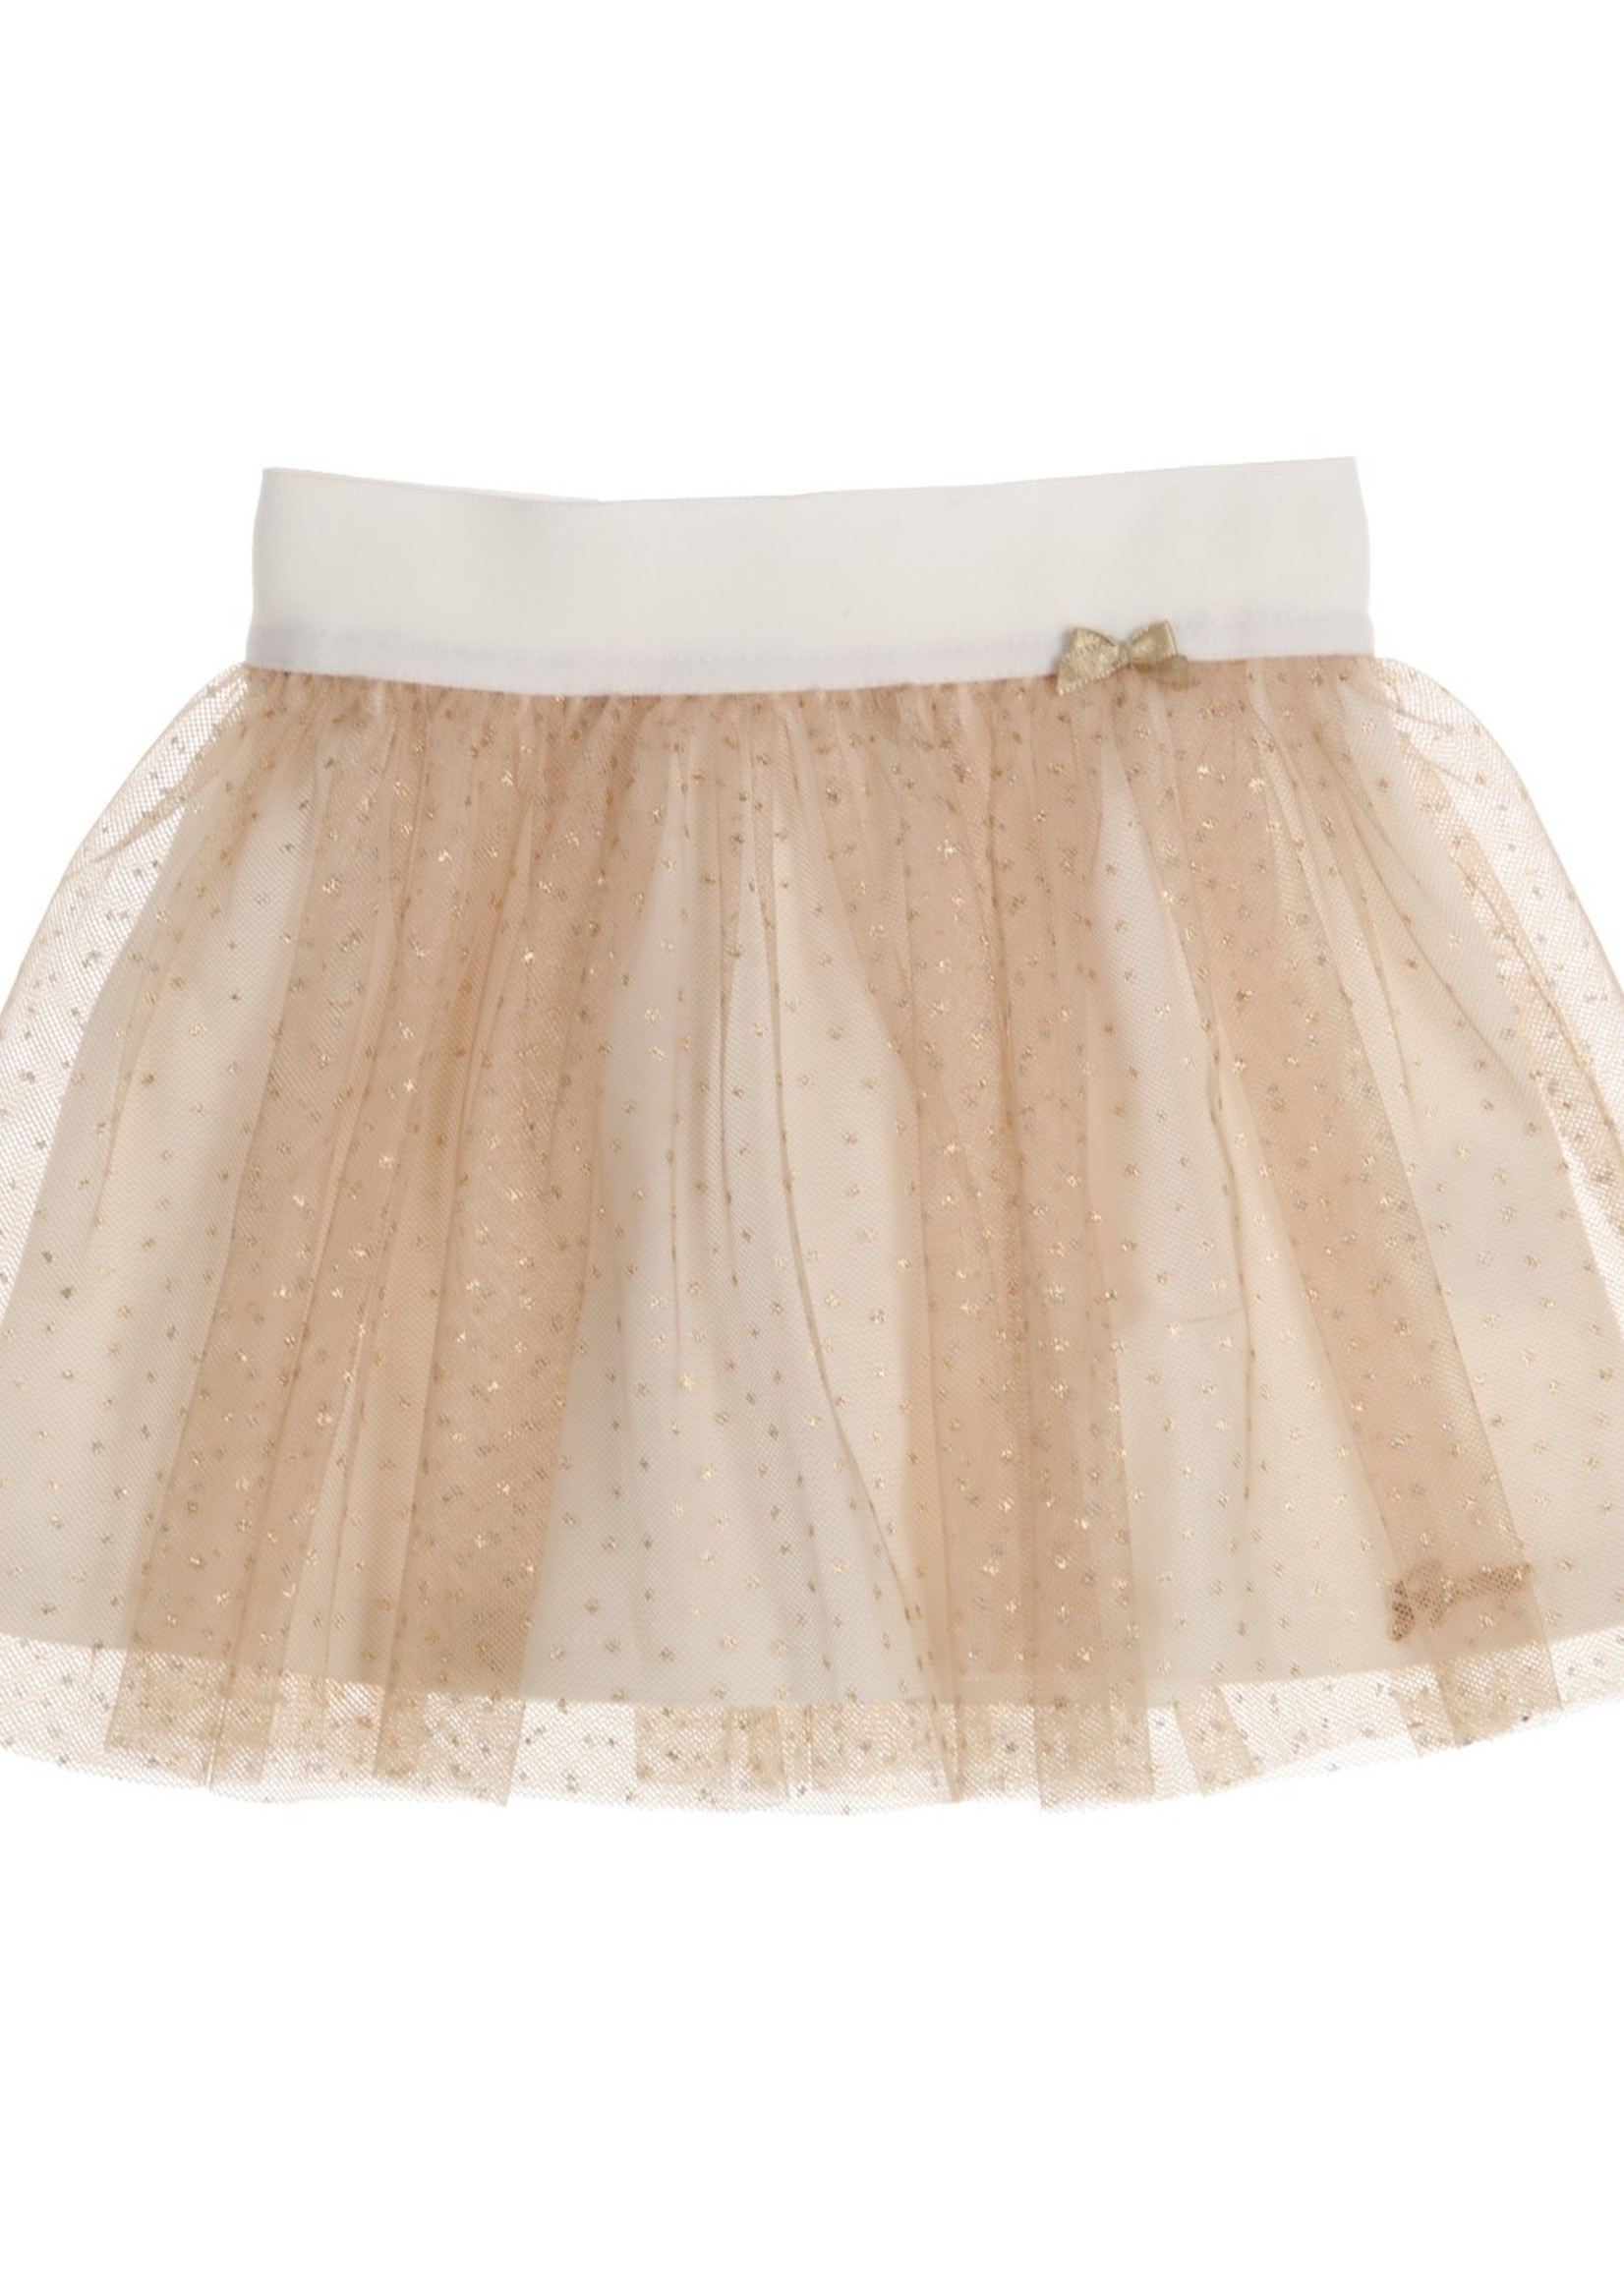 Gymp Gymp skirt off white goud